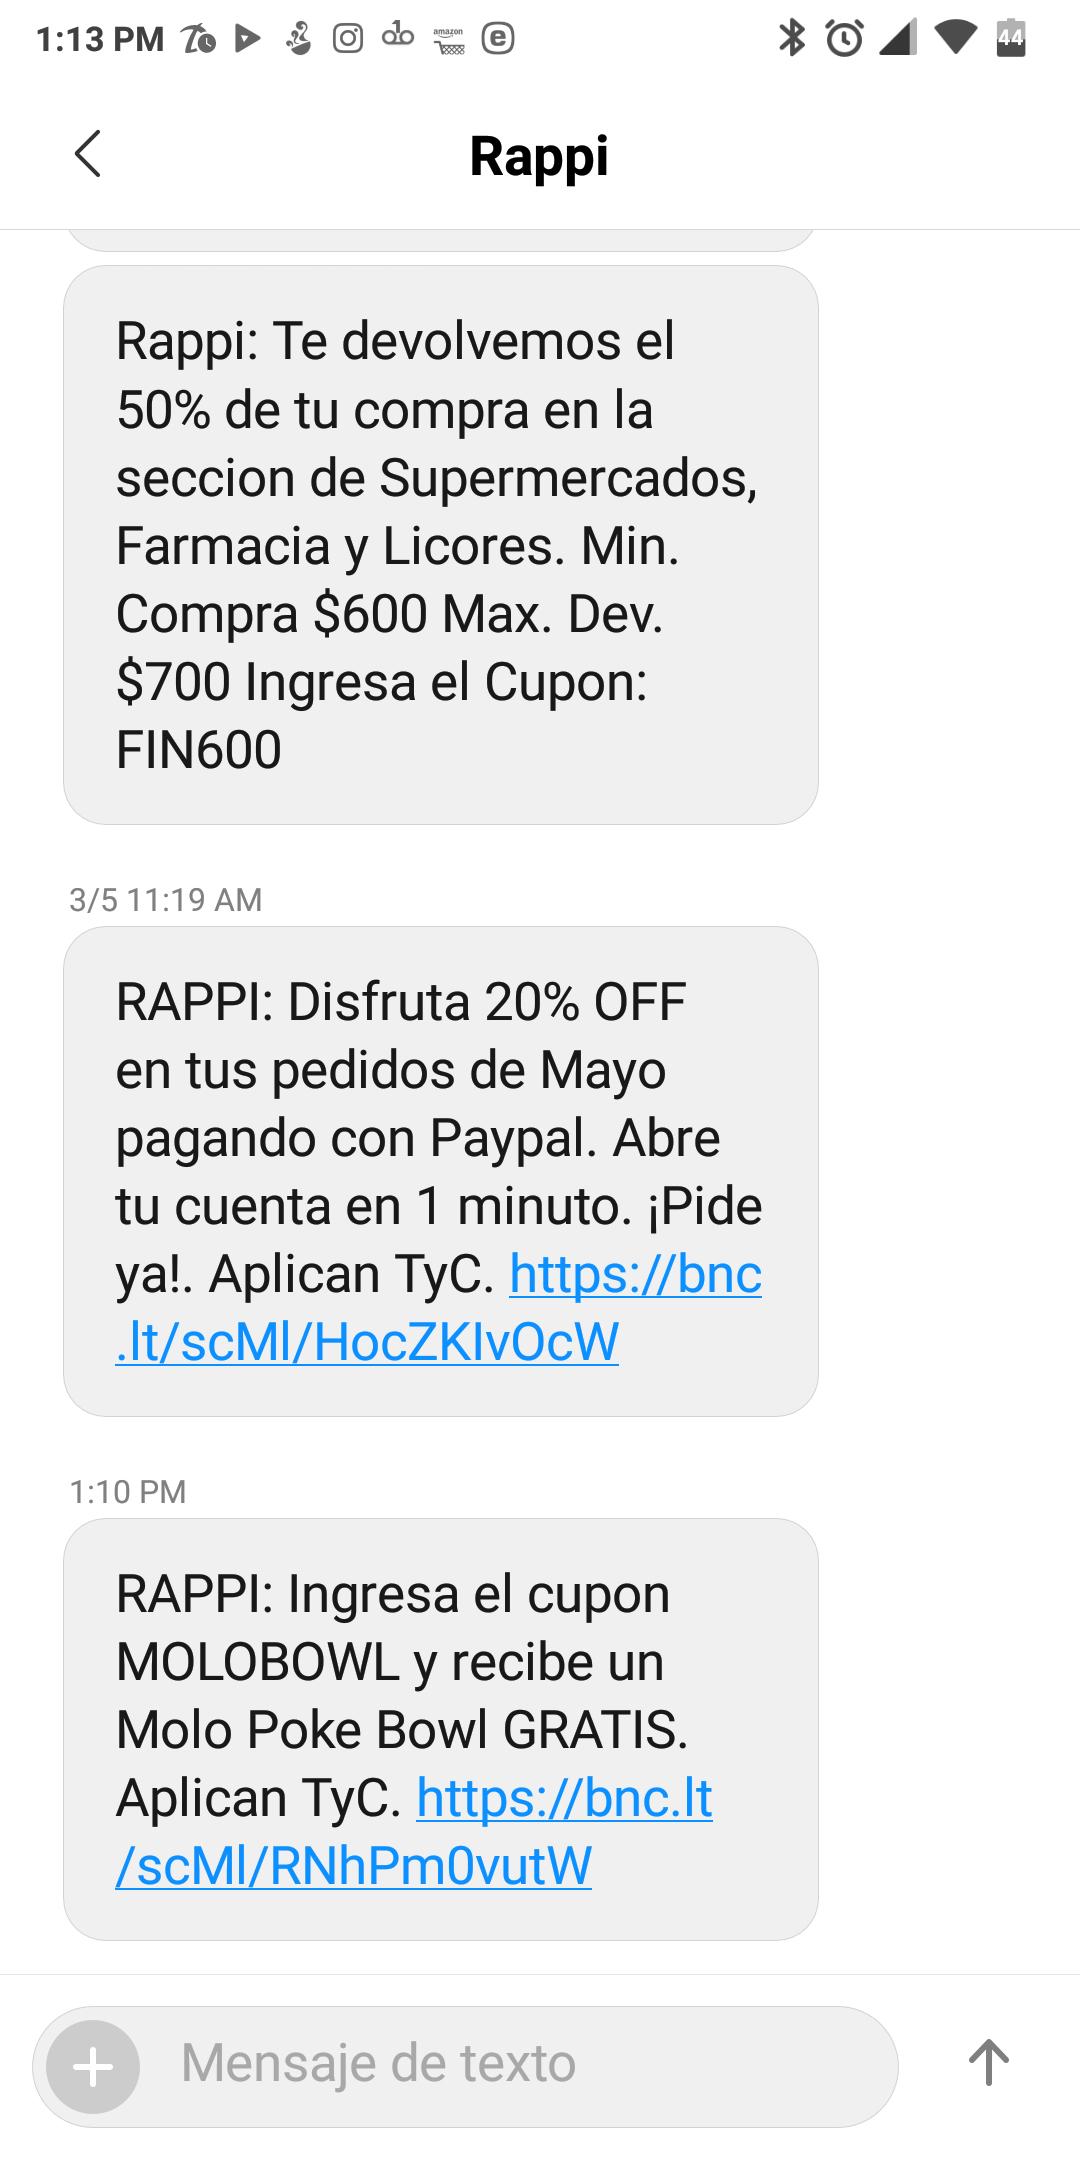 Rappi: molobowl gratis